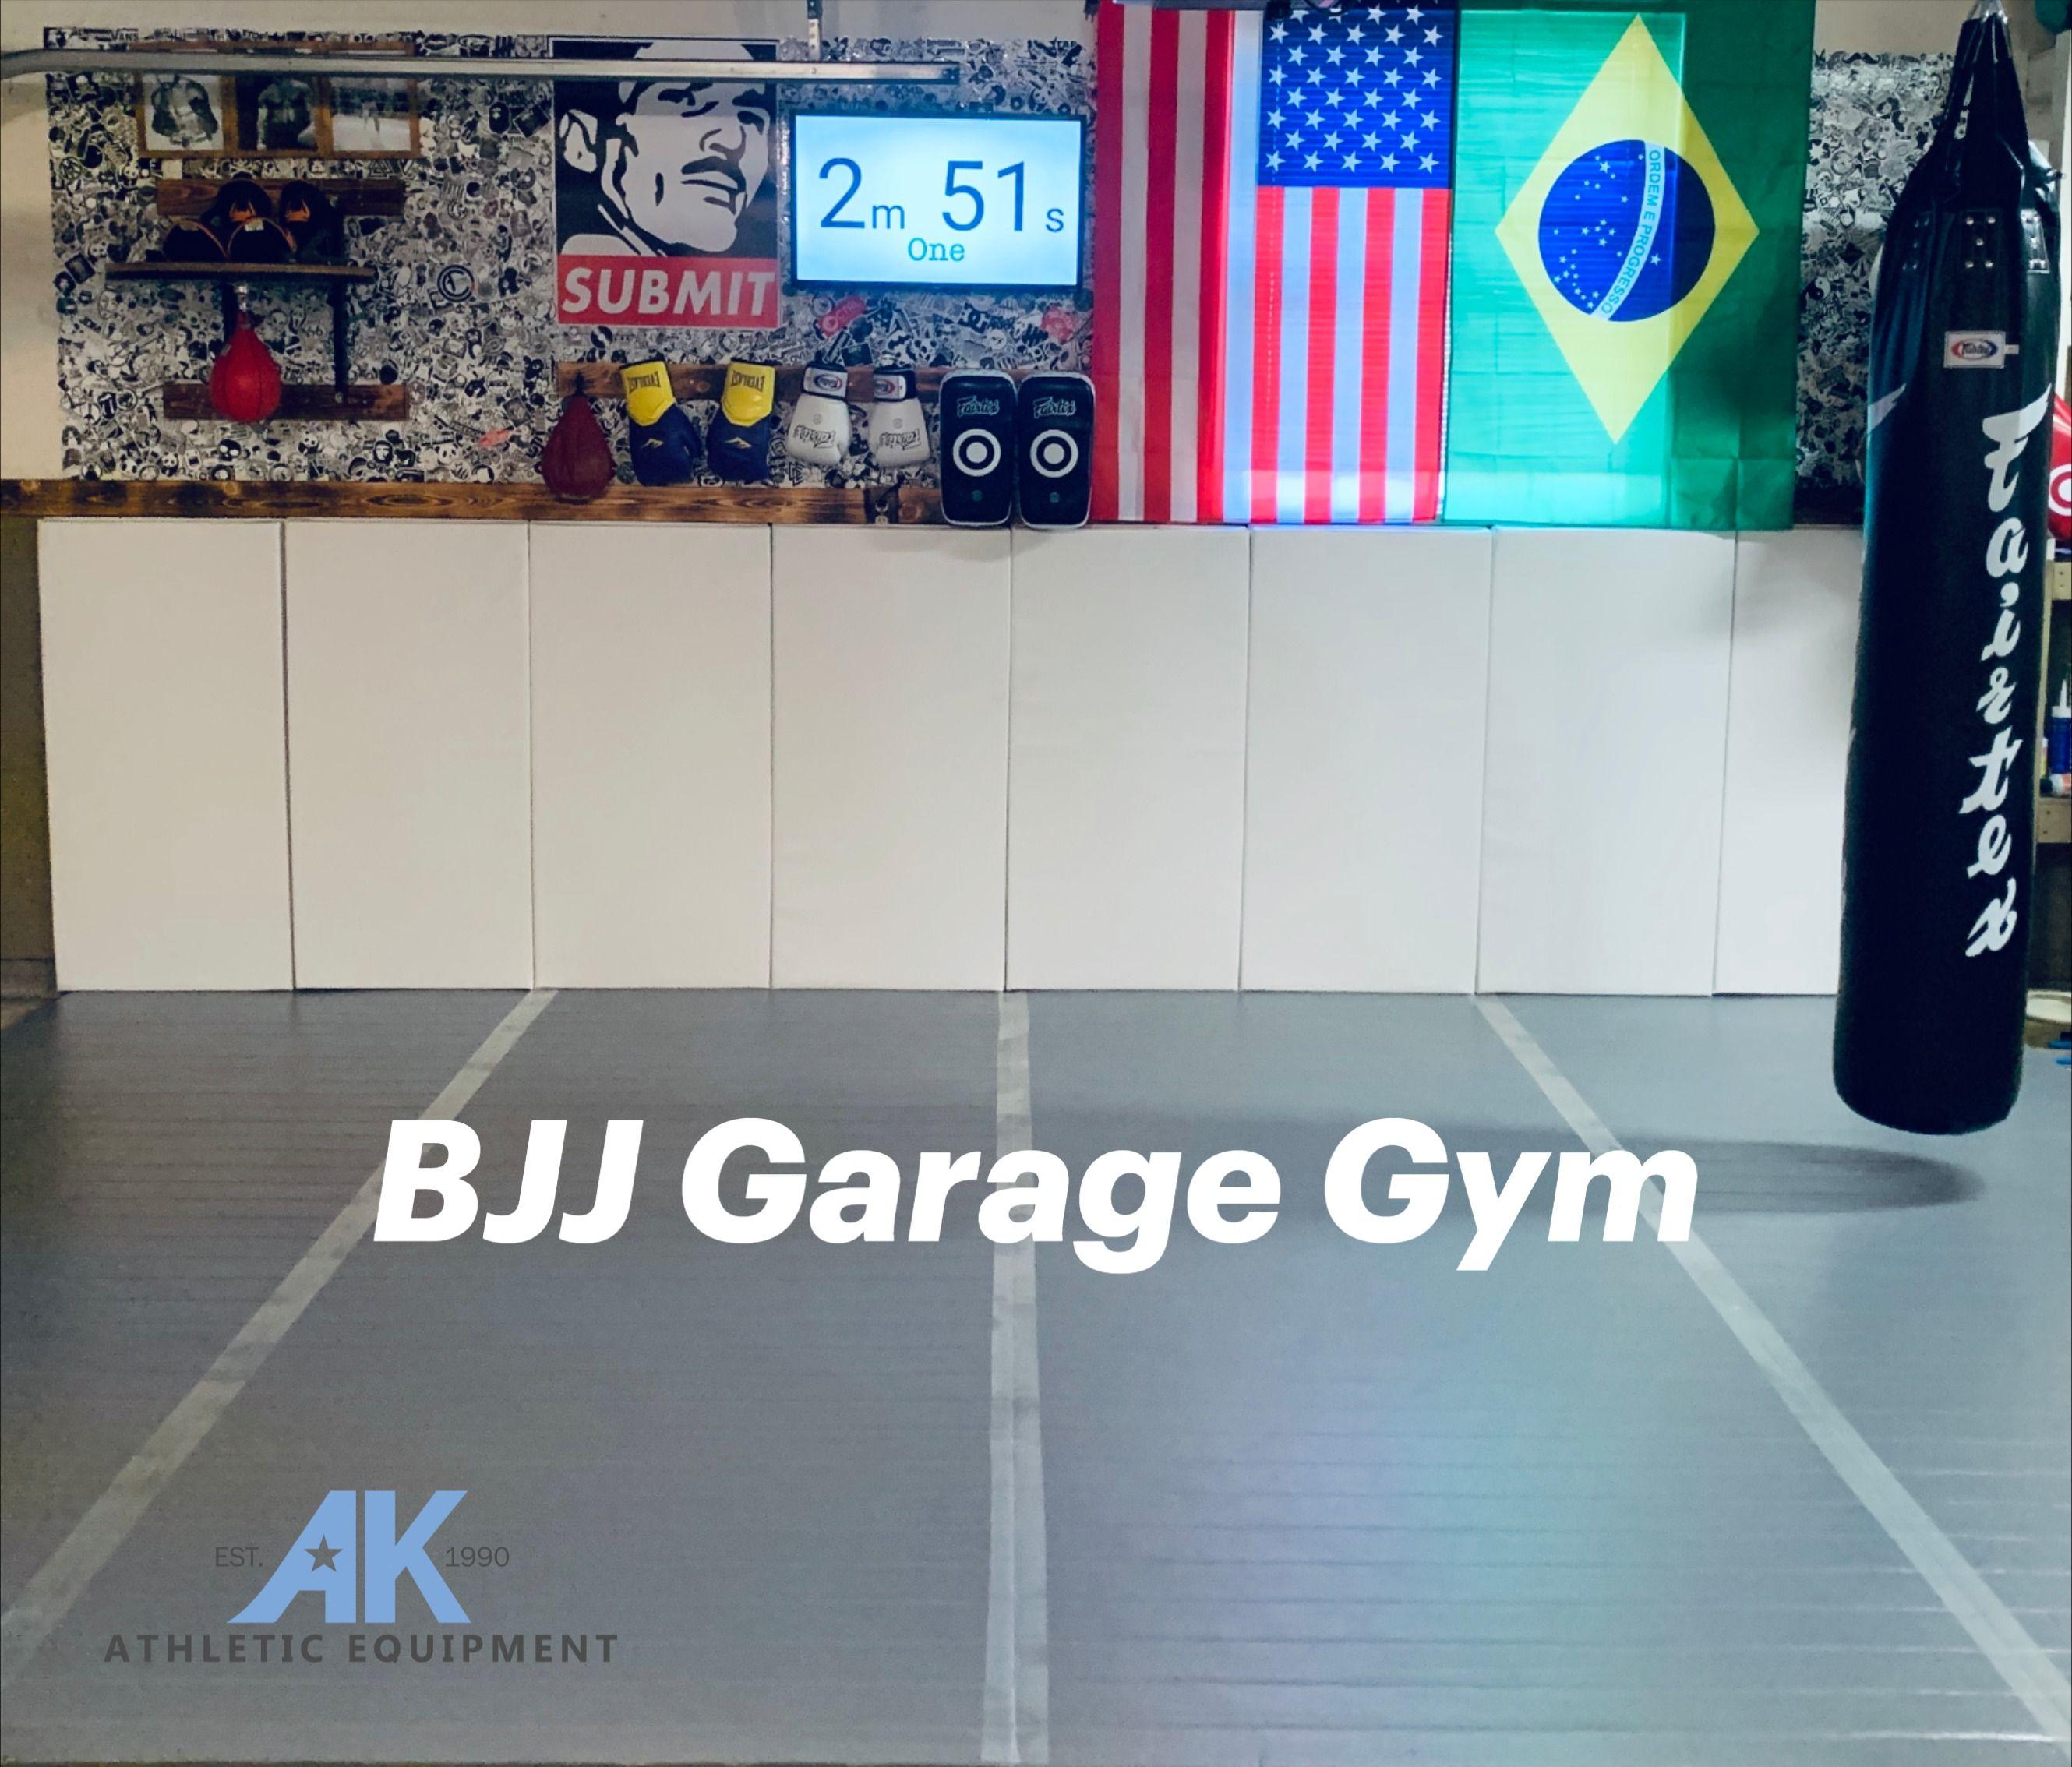 Brazilian Jiu Jitsu Room Bjj Room Bjj Garage Gym Home Bjj Room Design In 2020 Garage Gym Garage Gym Design Diy Home Gym